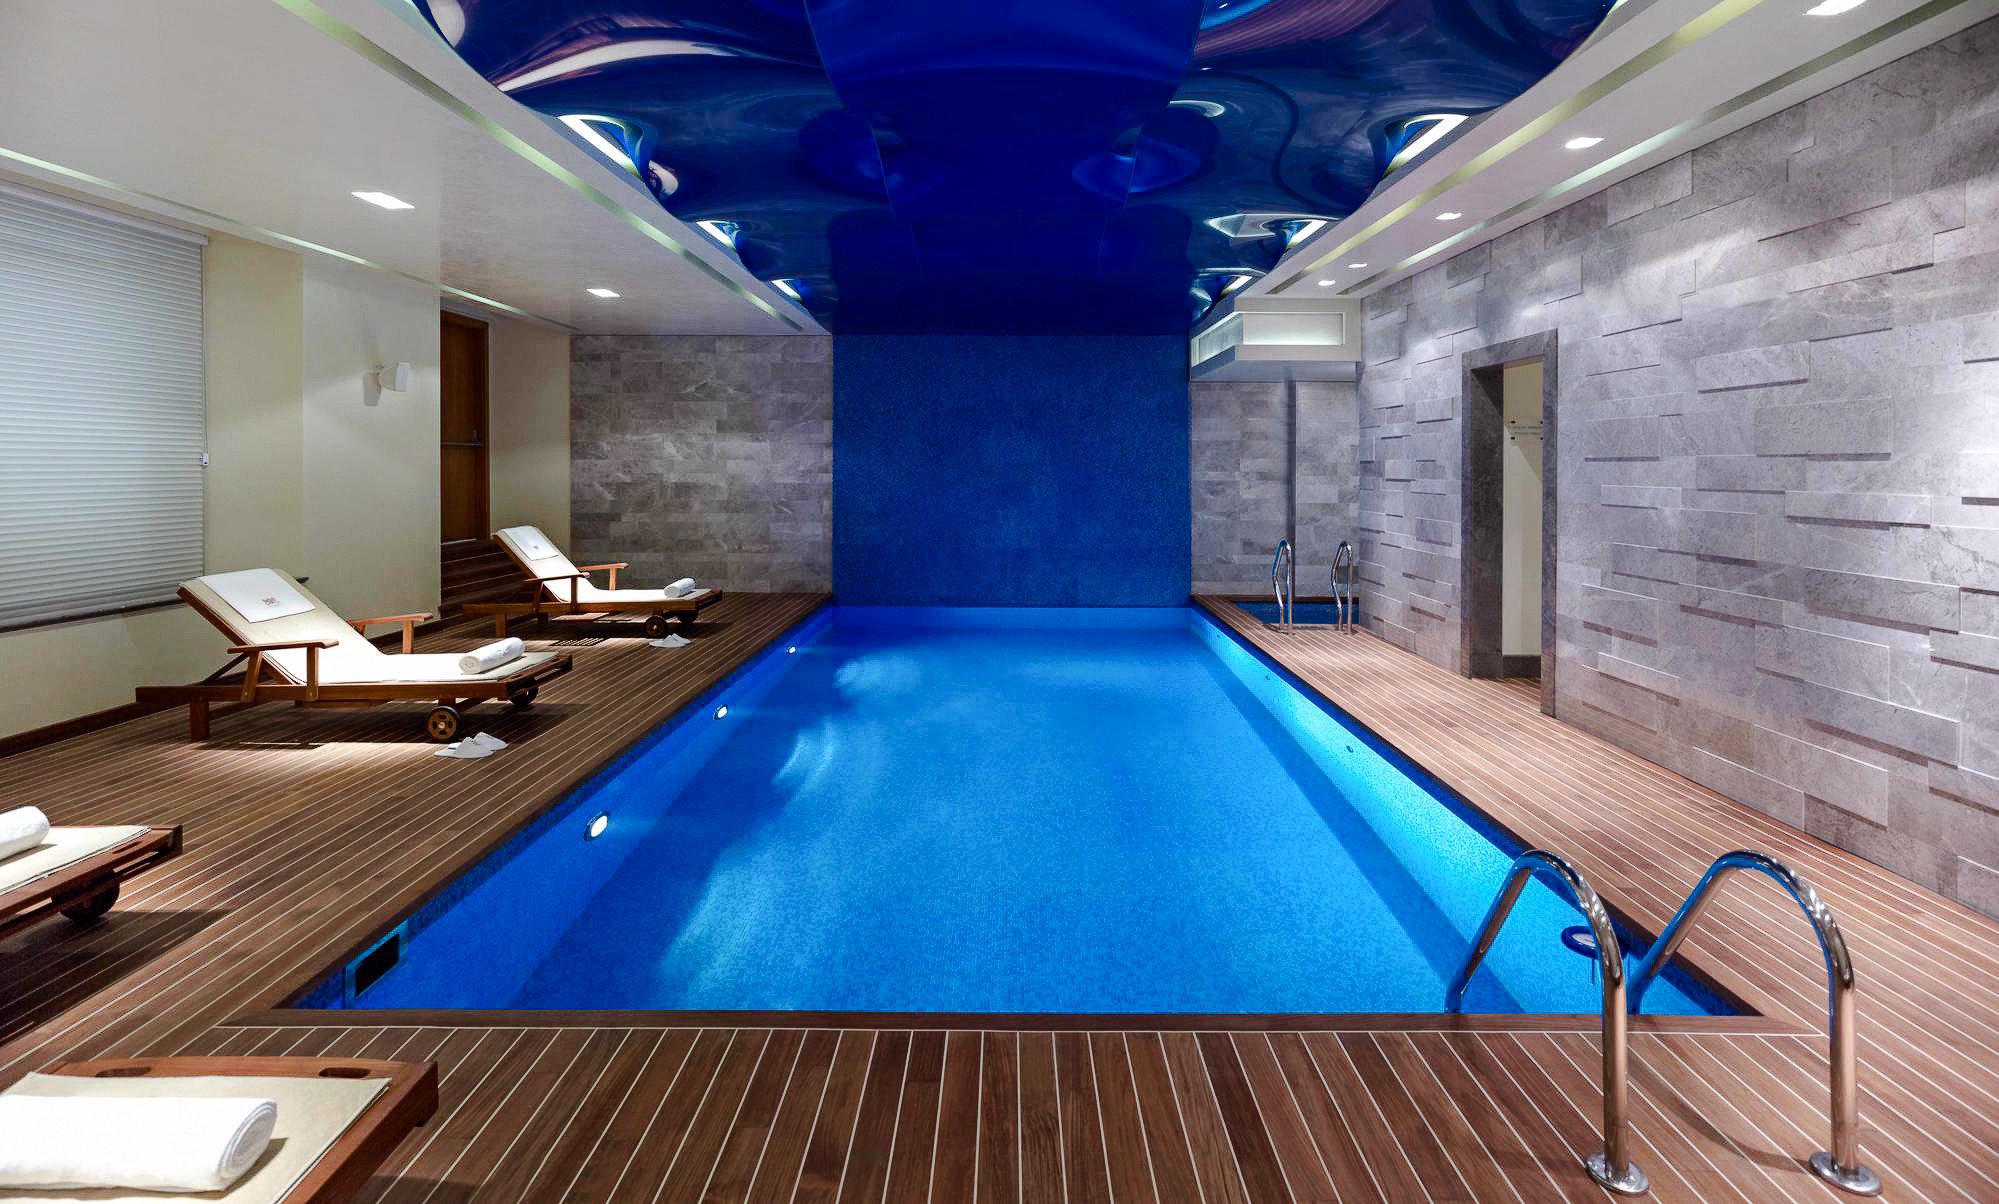 Boutique Hotels Hotels Luxury Travel swimming pool room interior design lighting floor leisure recreation room leisure centre flooring daylighting amenity ceiling estate blue